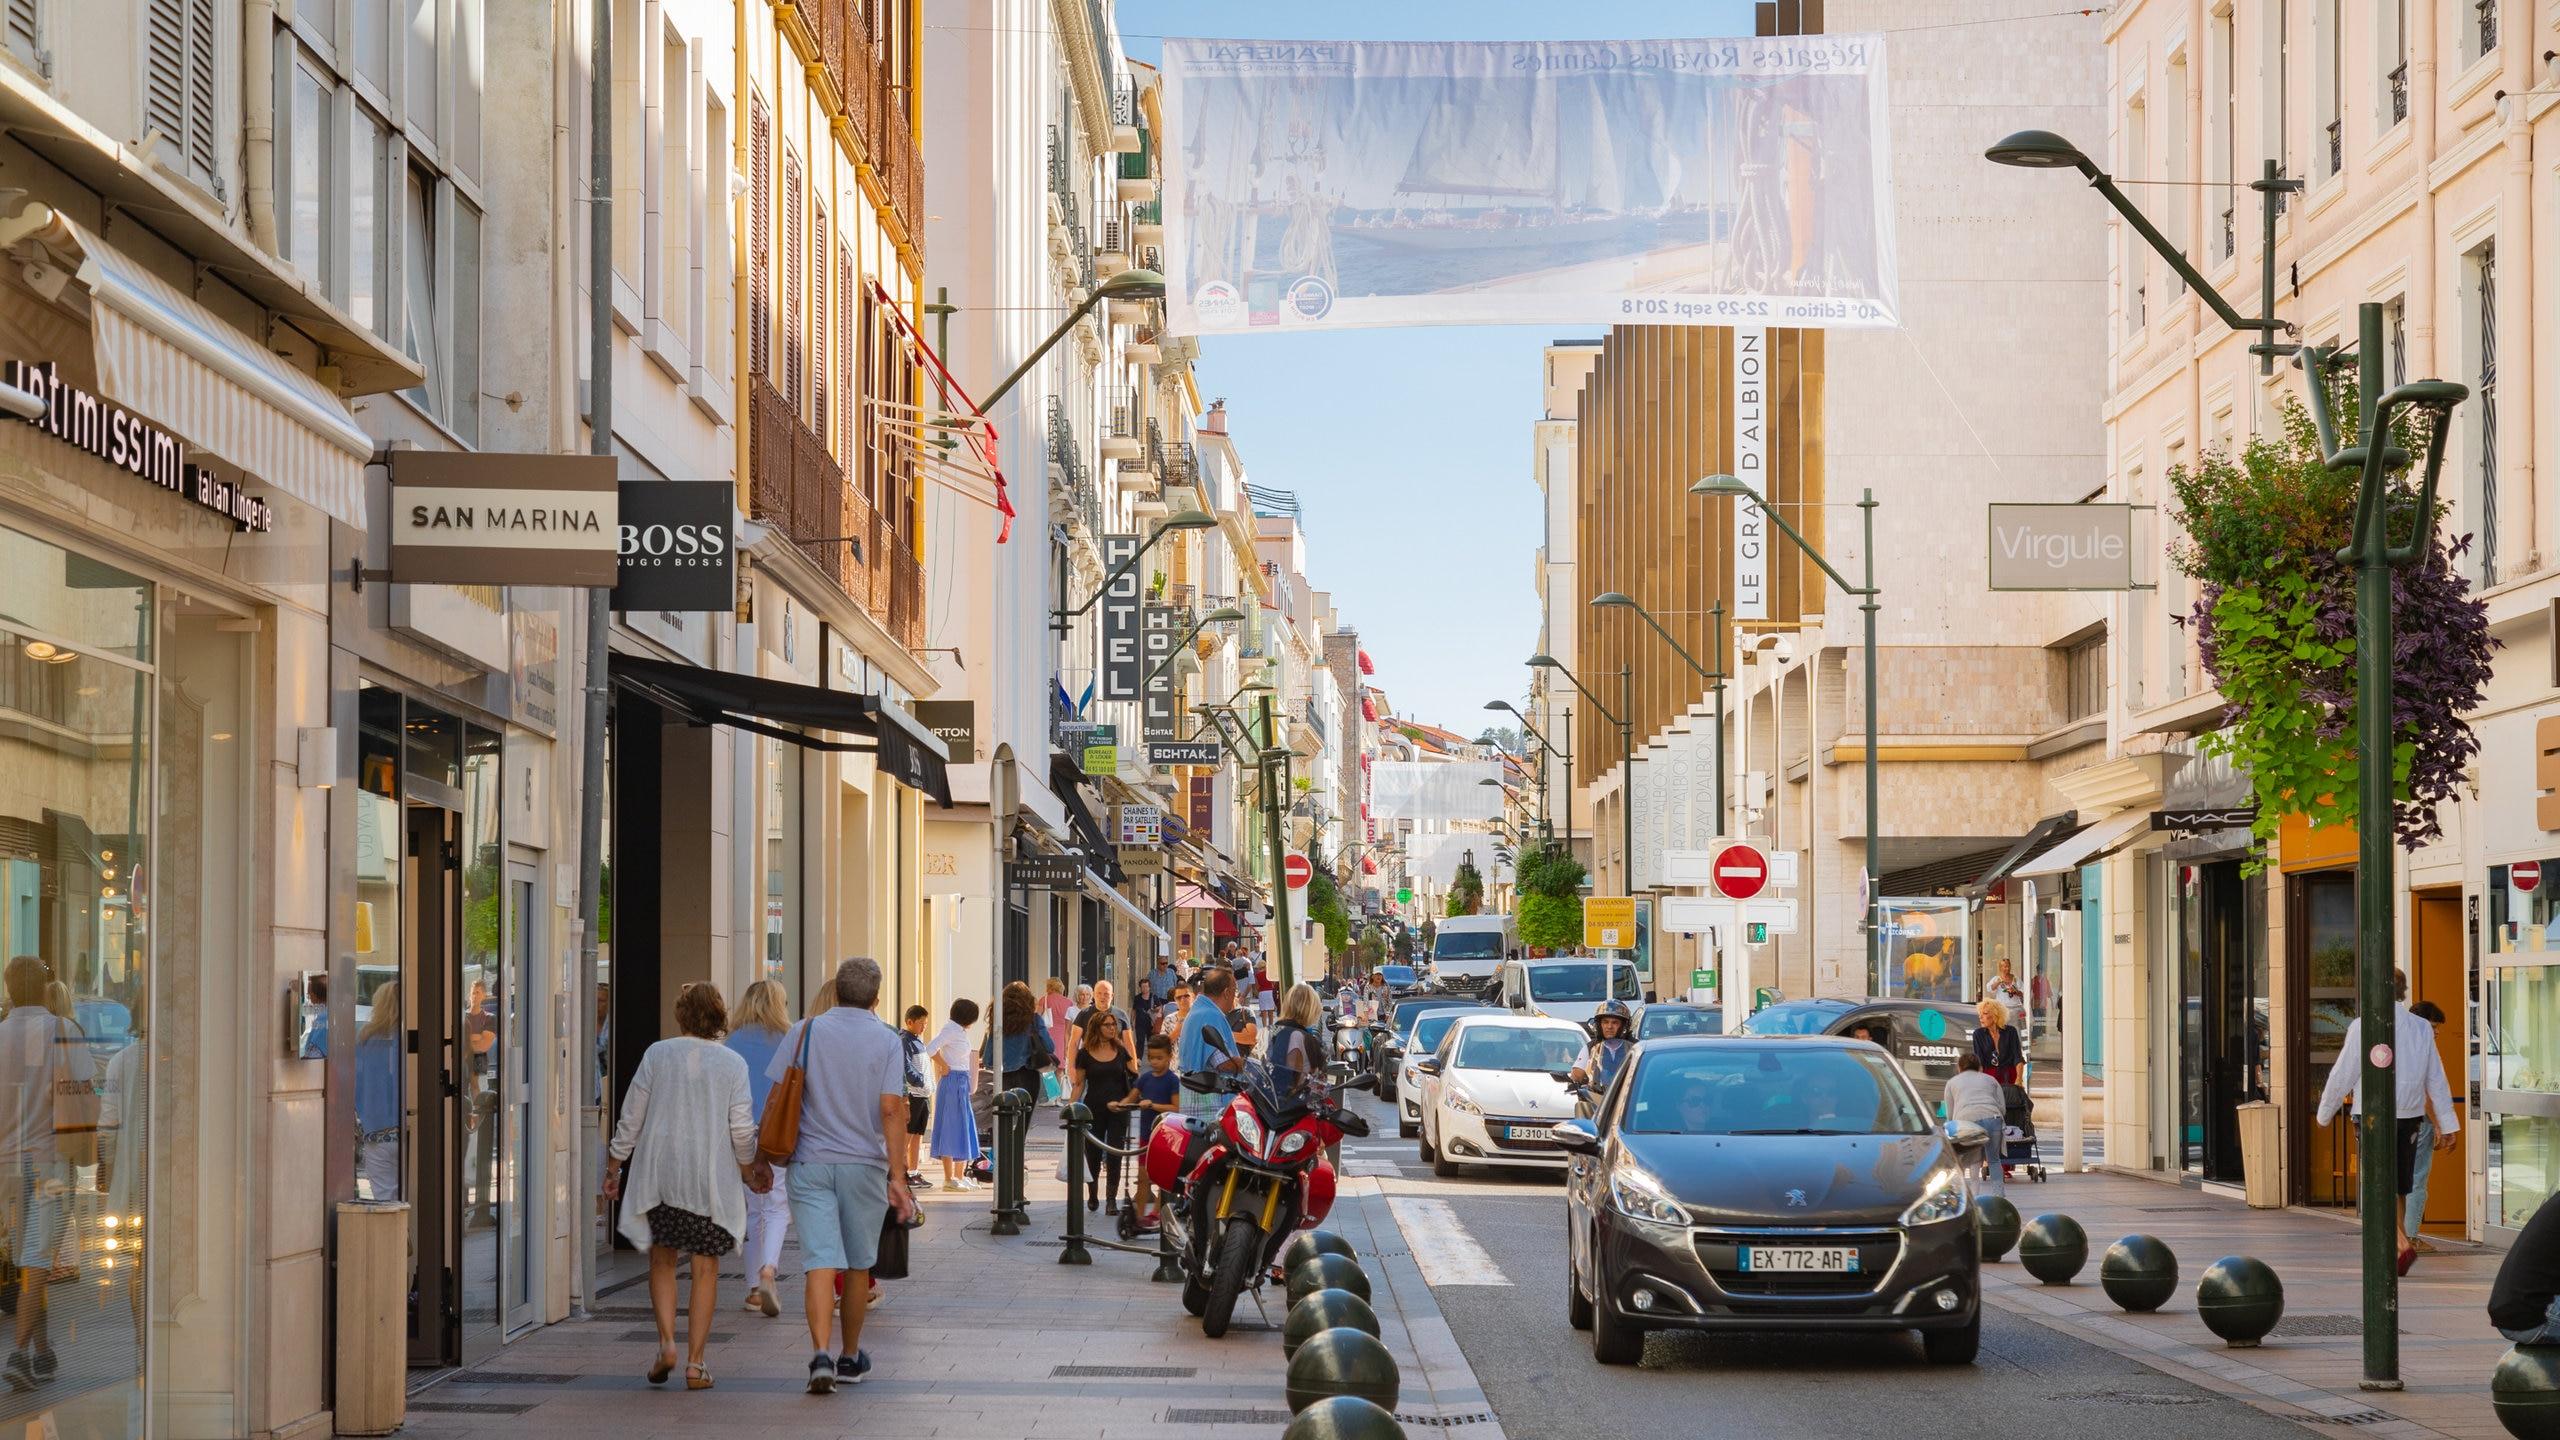 Rue d'Antibes, Cannes, Alpes-Maritimes, France